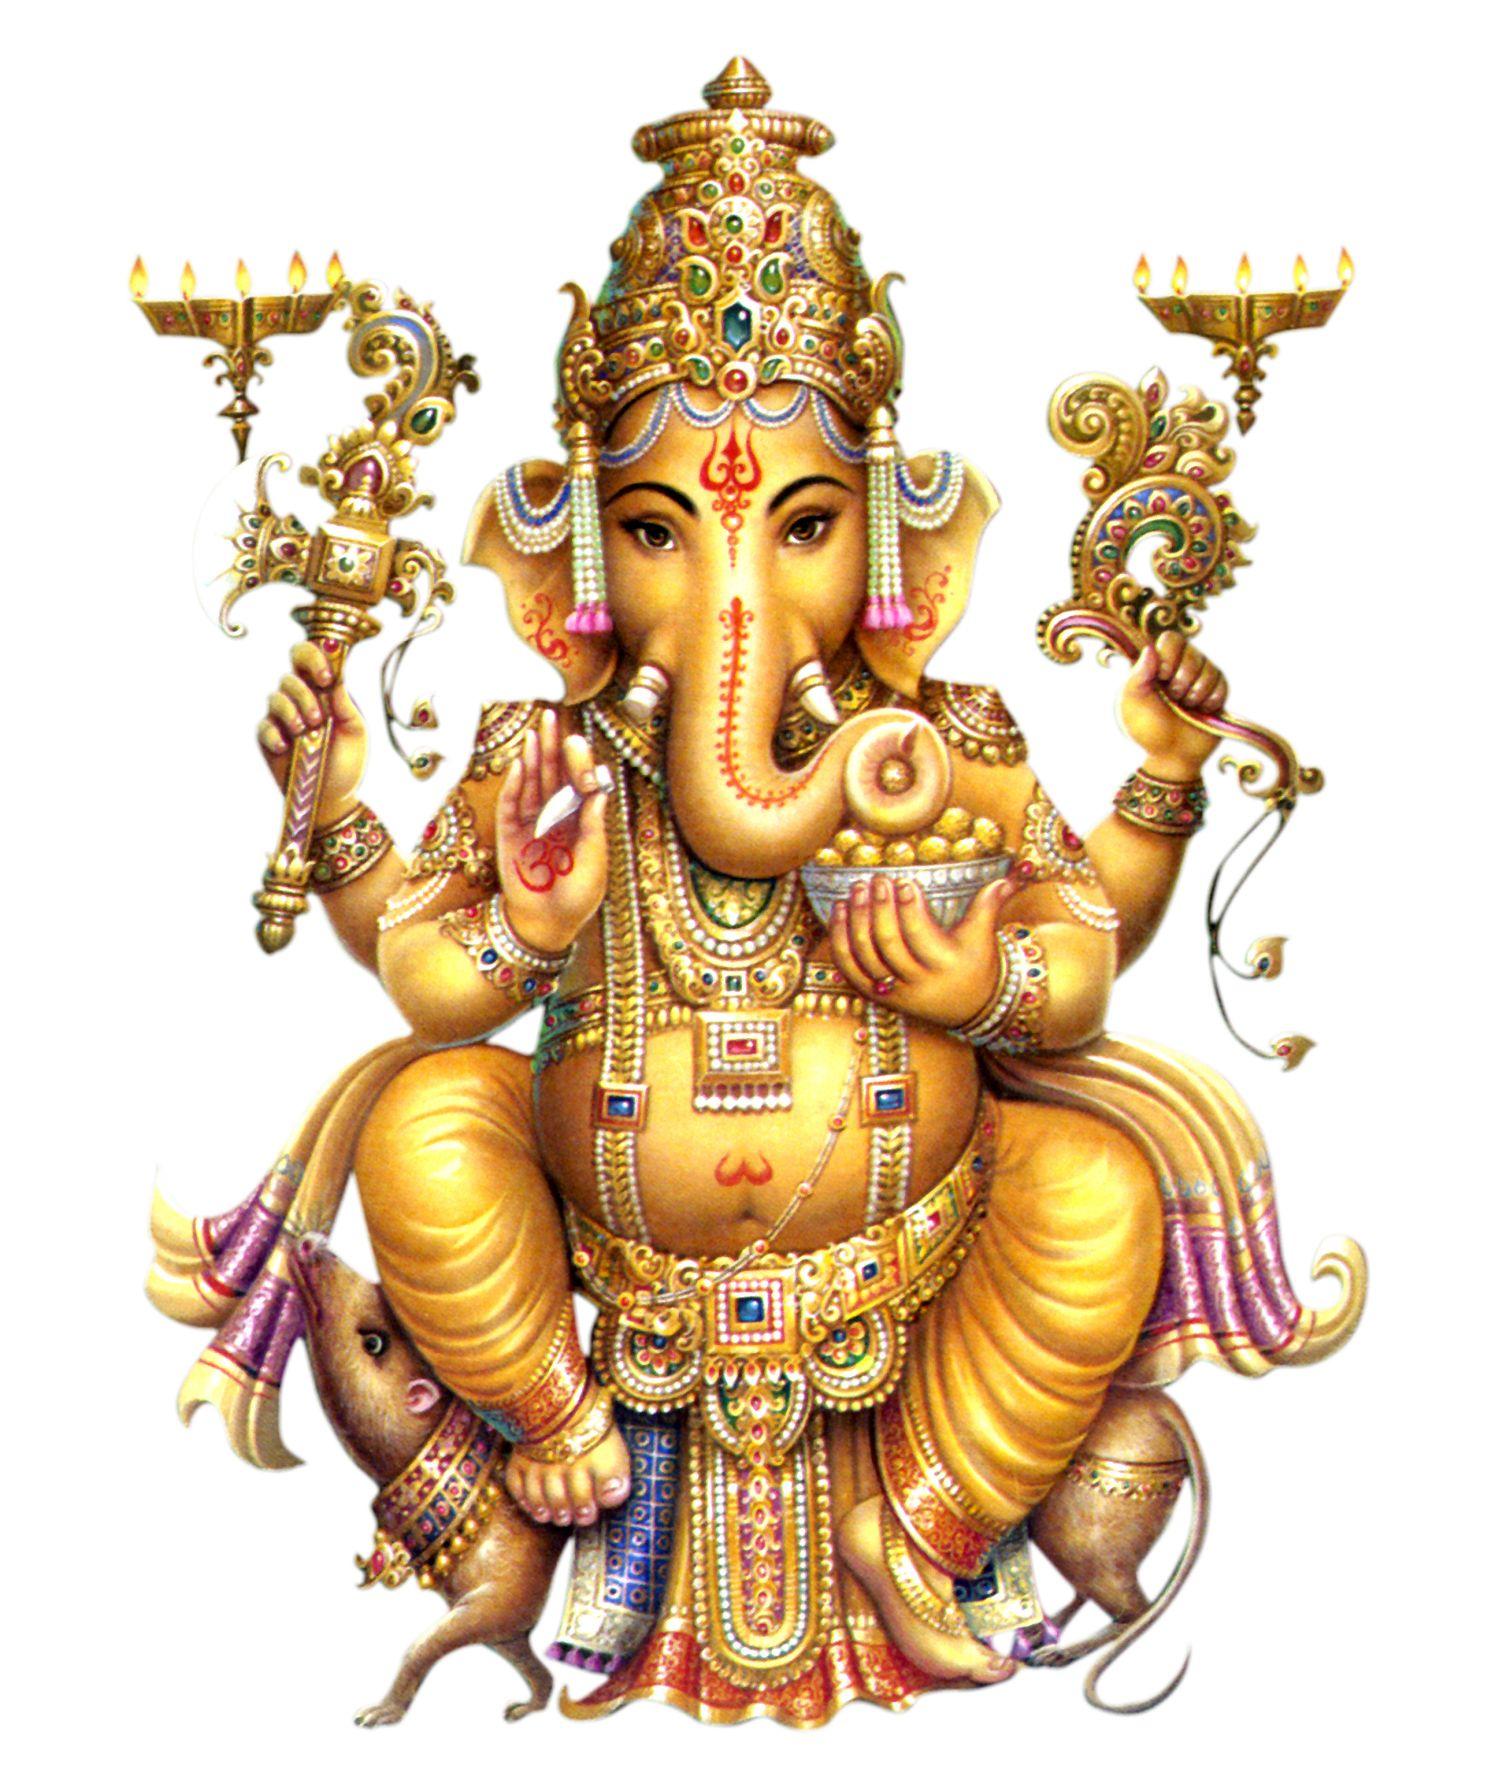 Preety Ganesha Hd Wallpaper Jpg 1 500 1 780 Pixels Ganesha Ganesh Chaturthi Images Lord Ganesha